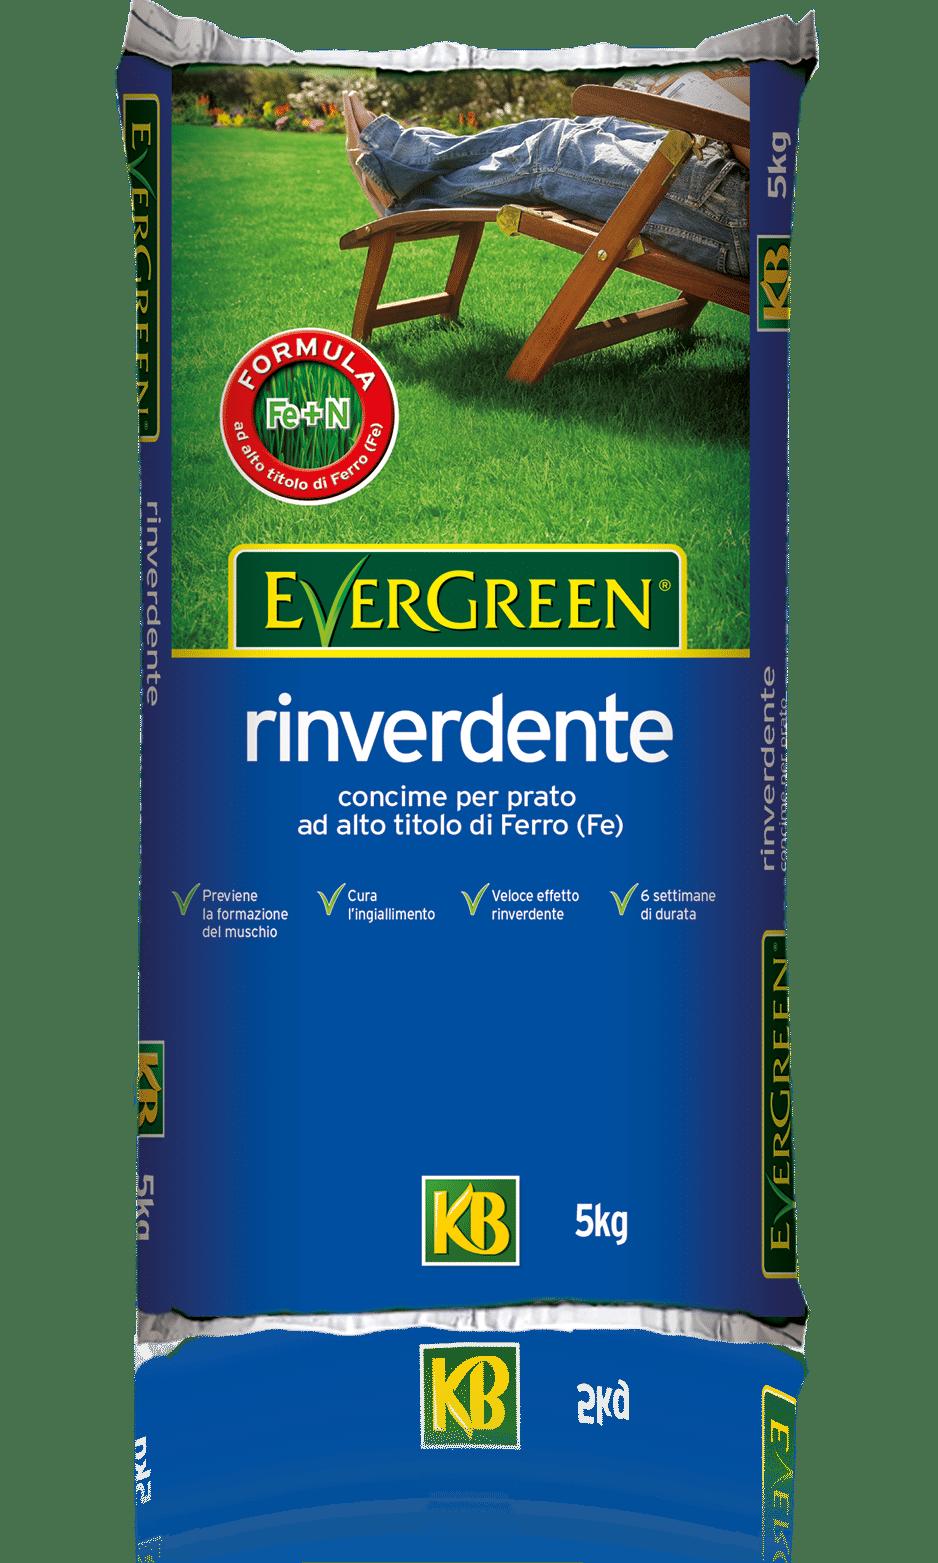 Evergreen_rinverdente